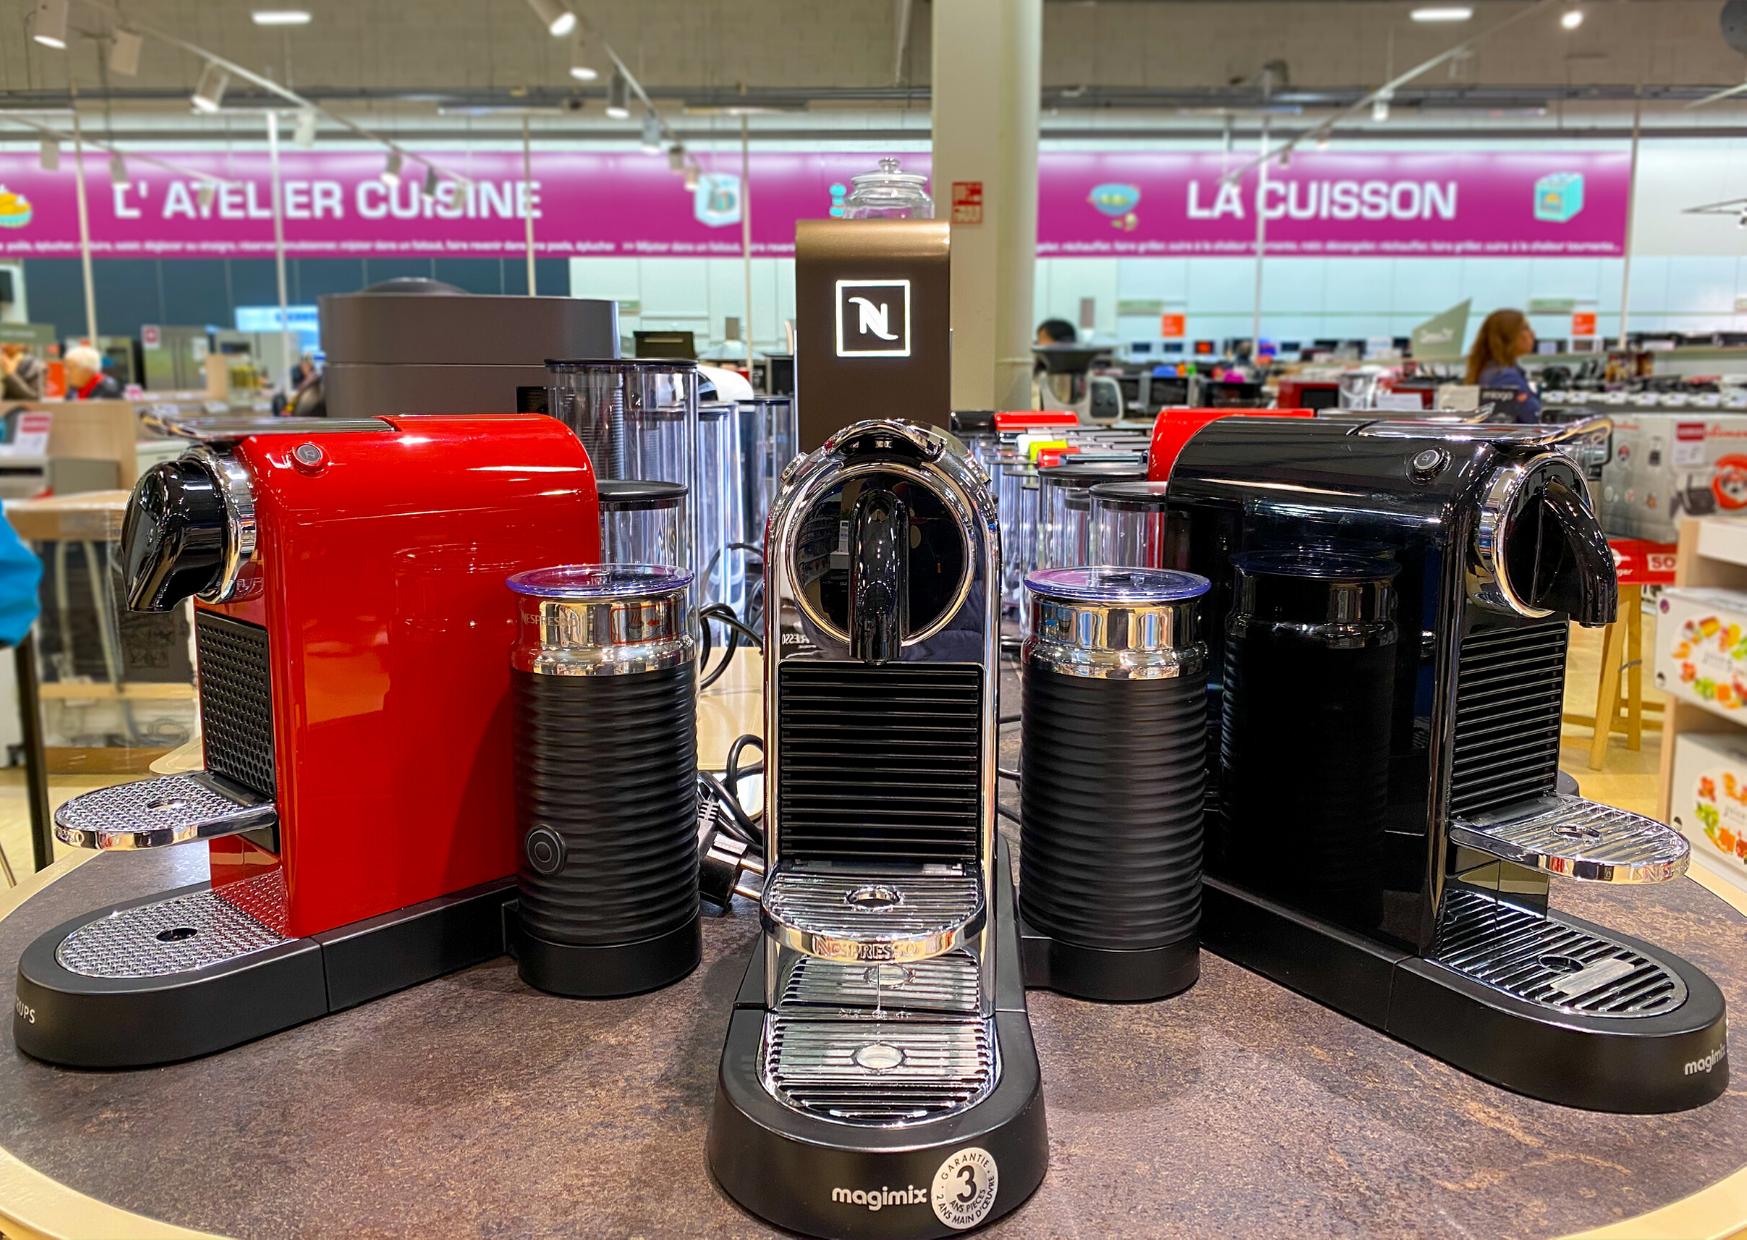 Espace Nespresso Boulanger Toulon La Garde Magasin Boulanger Toulon La Garde